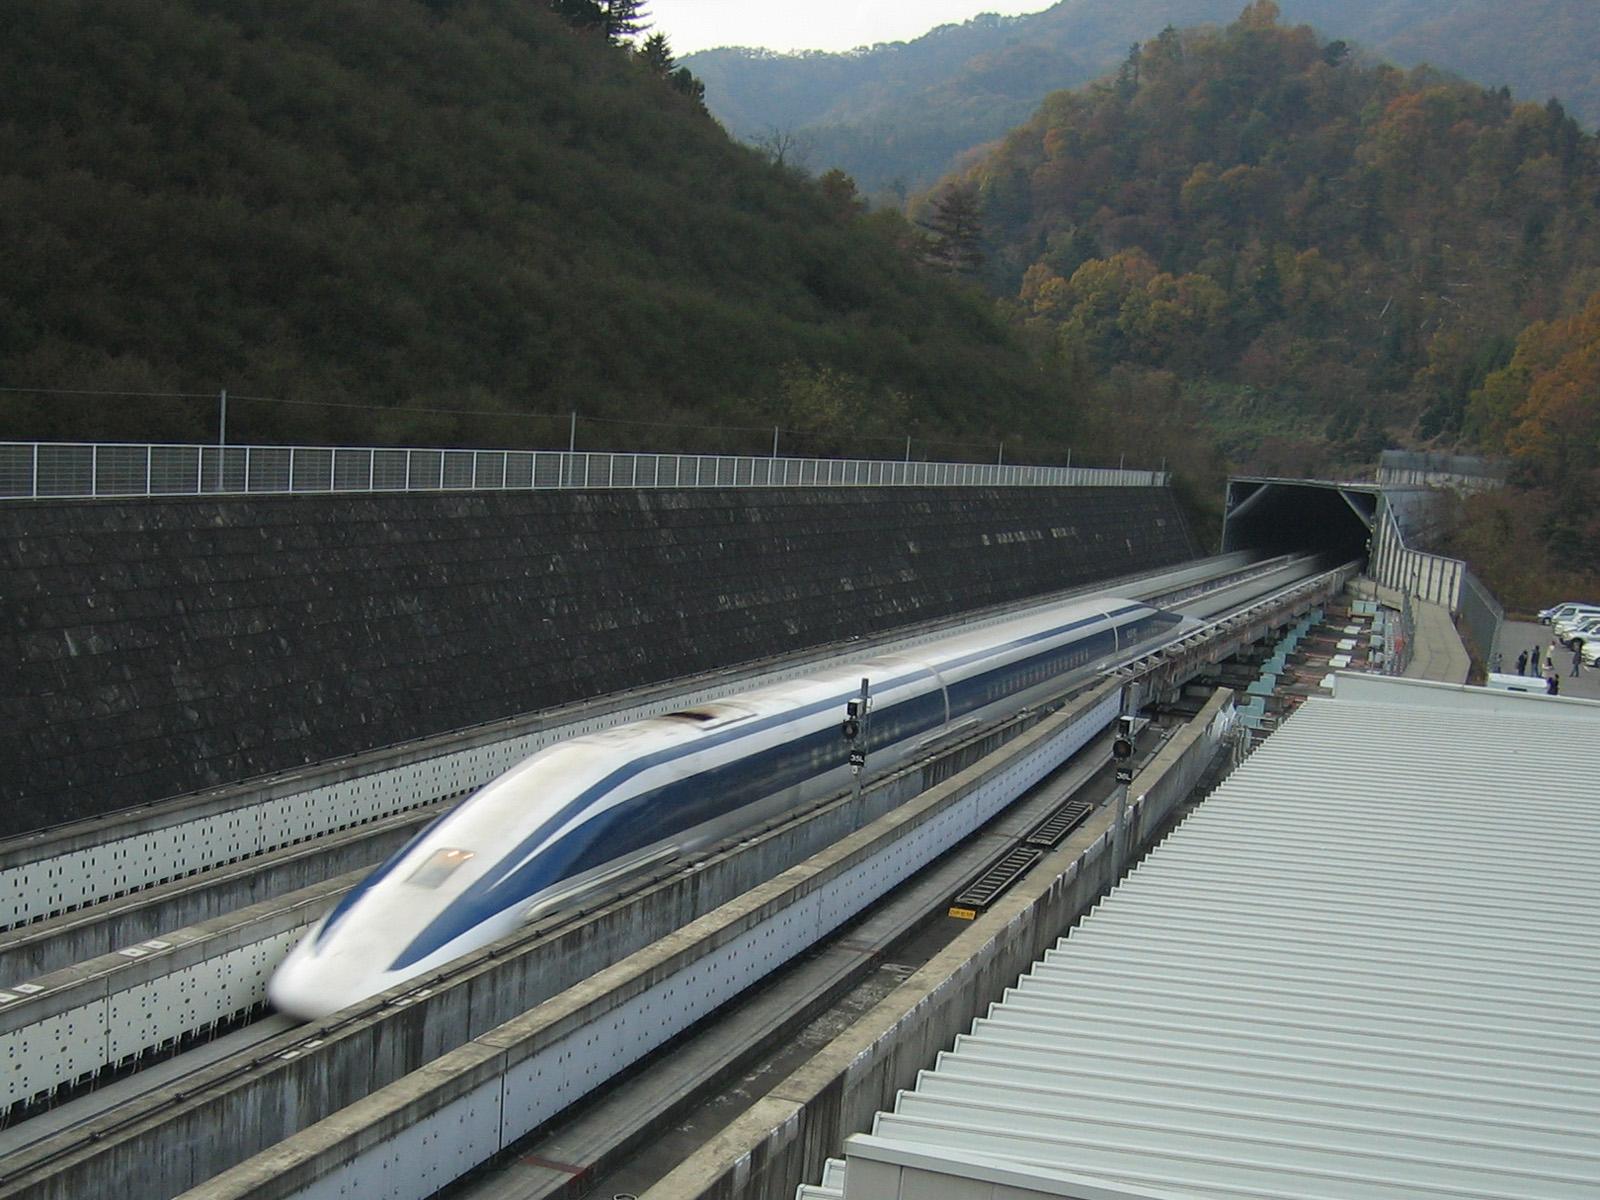 Maglev topspeed 590km/h